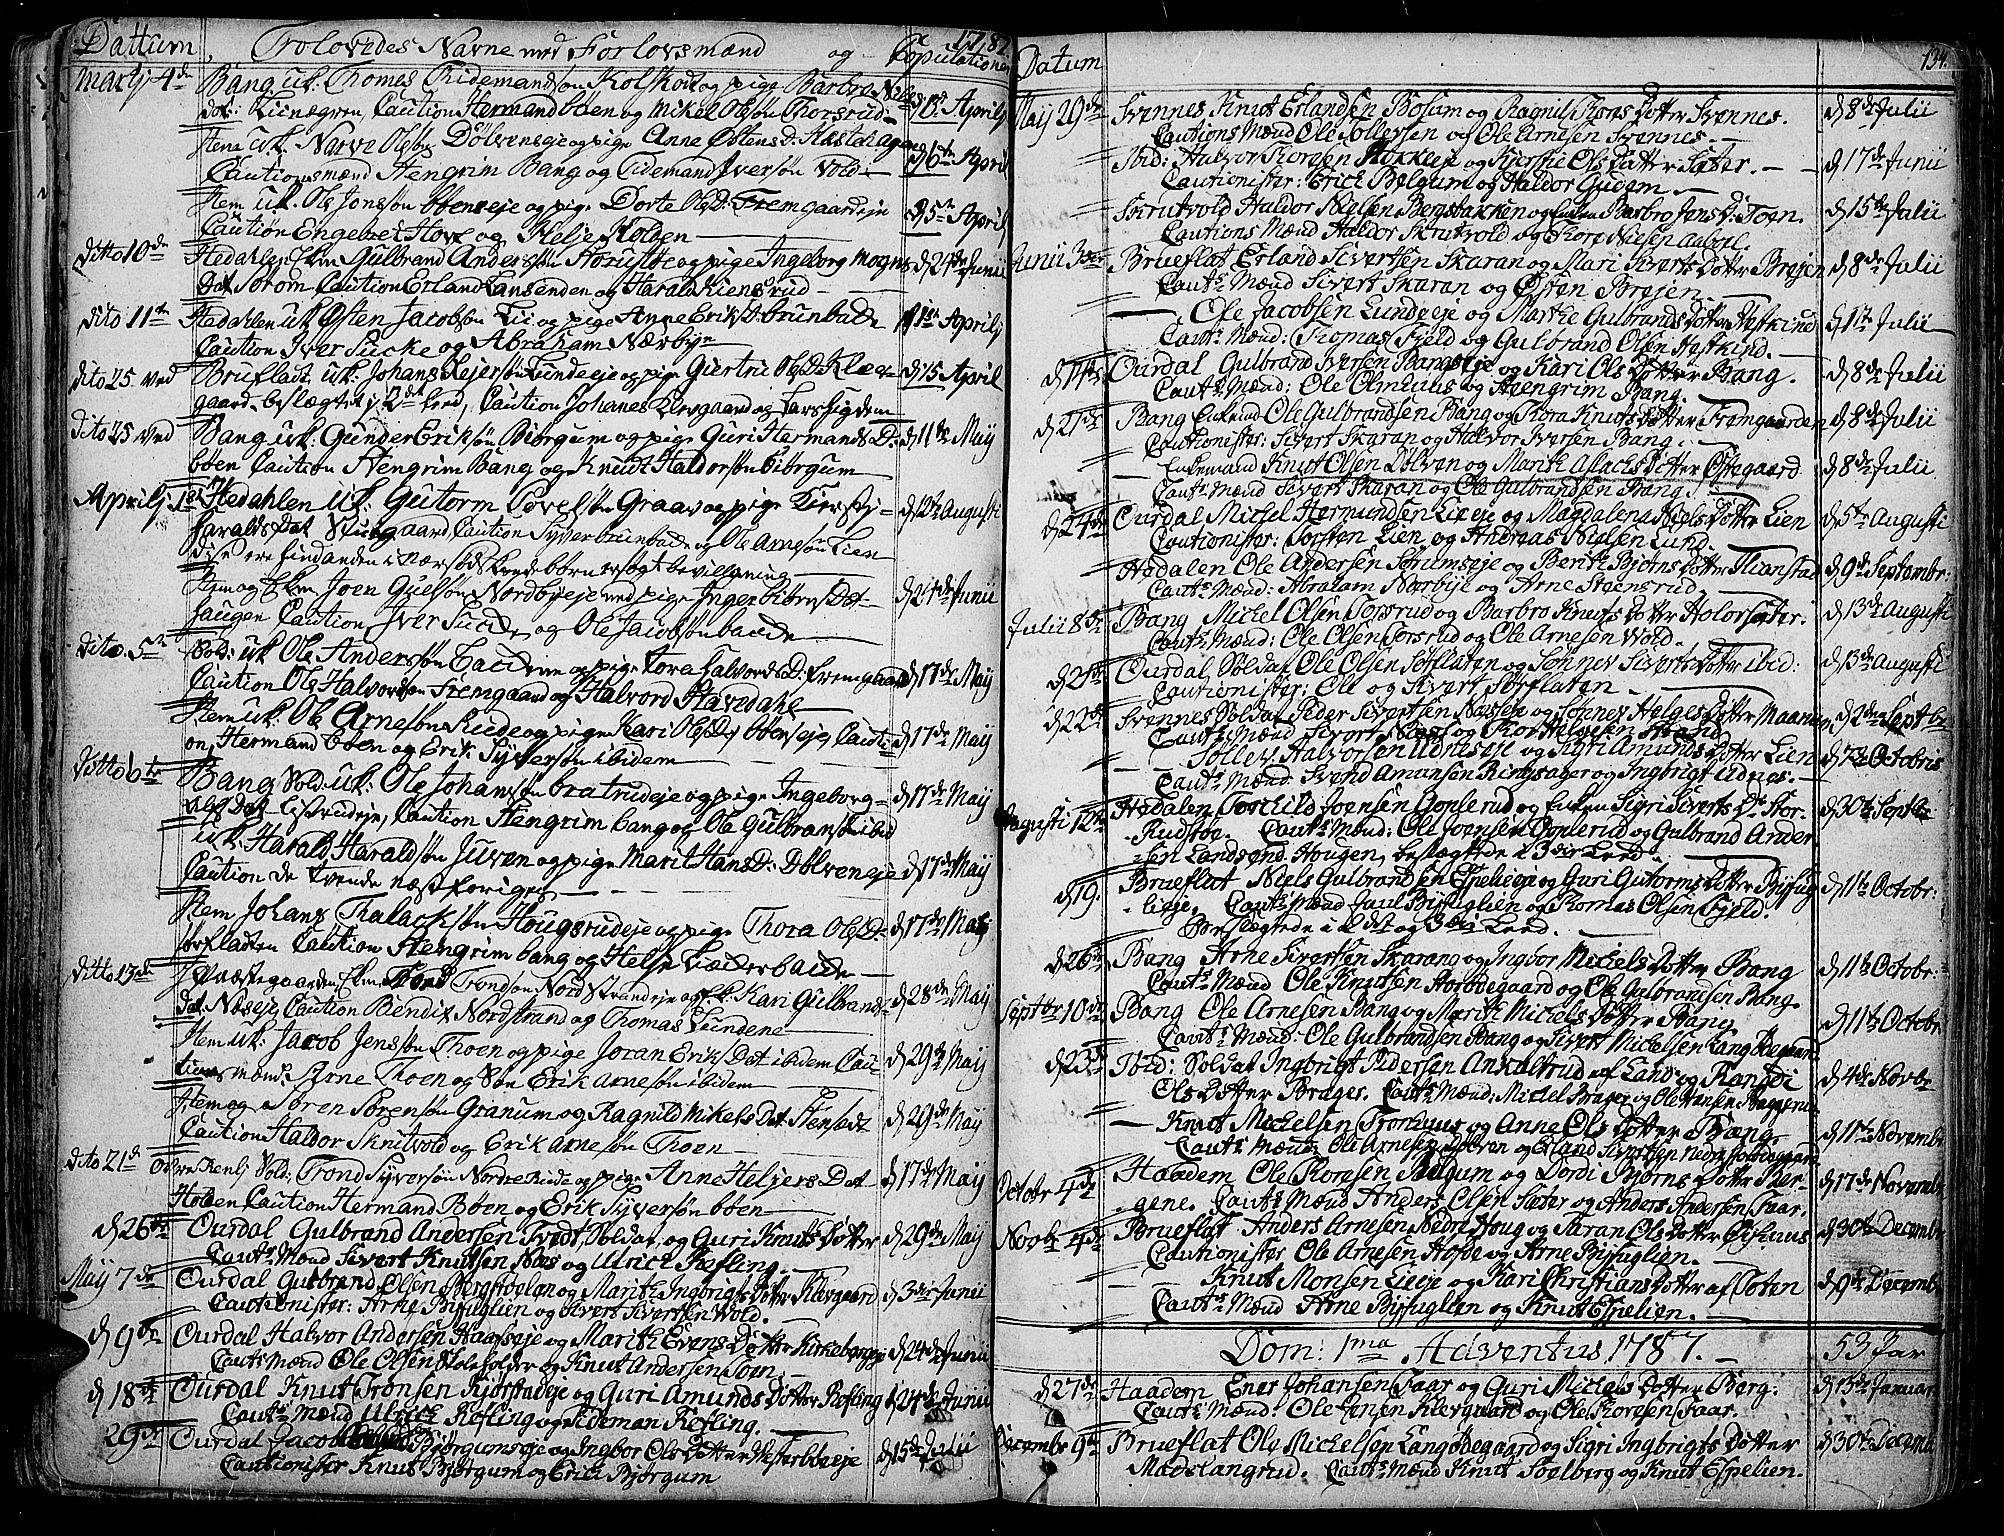 SAH, Aurdal prestekontor, Ministerialbok nr. 6, 1781-1804, s. 134